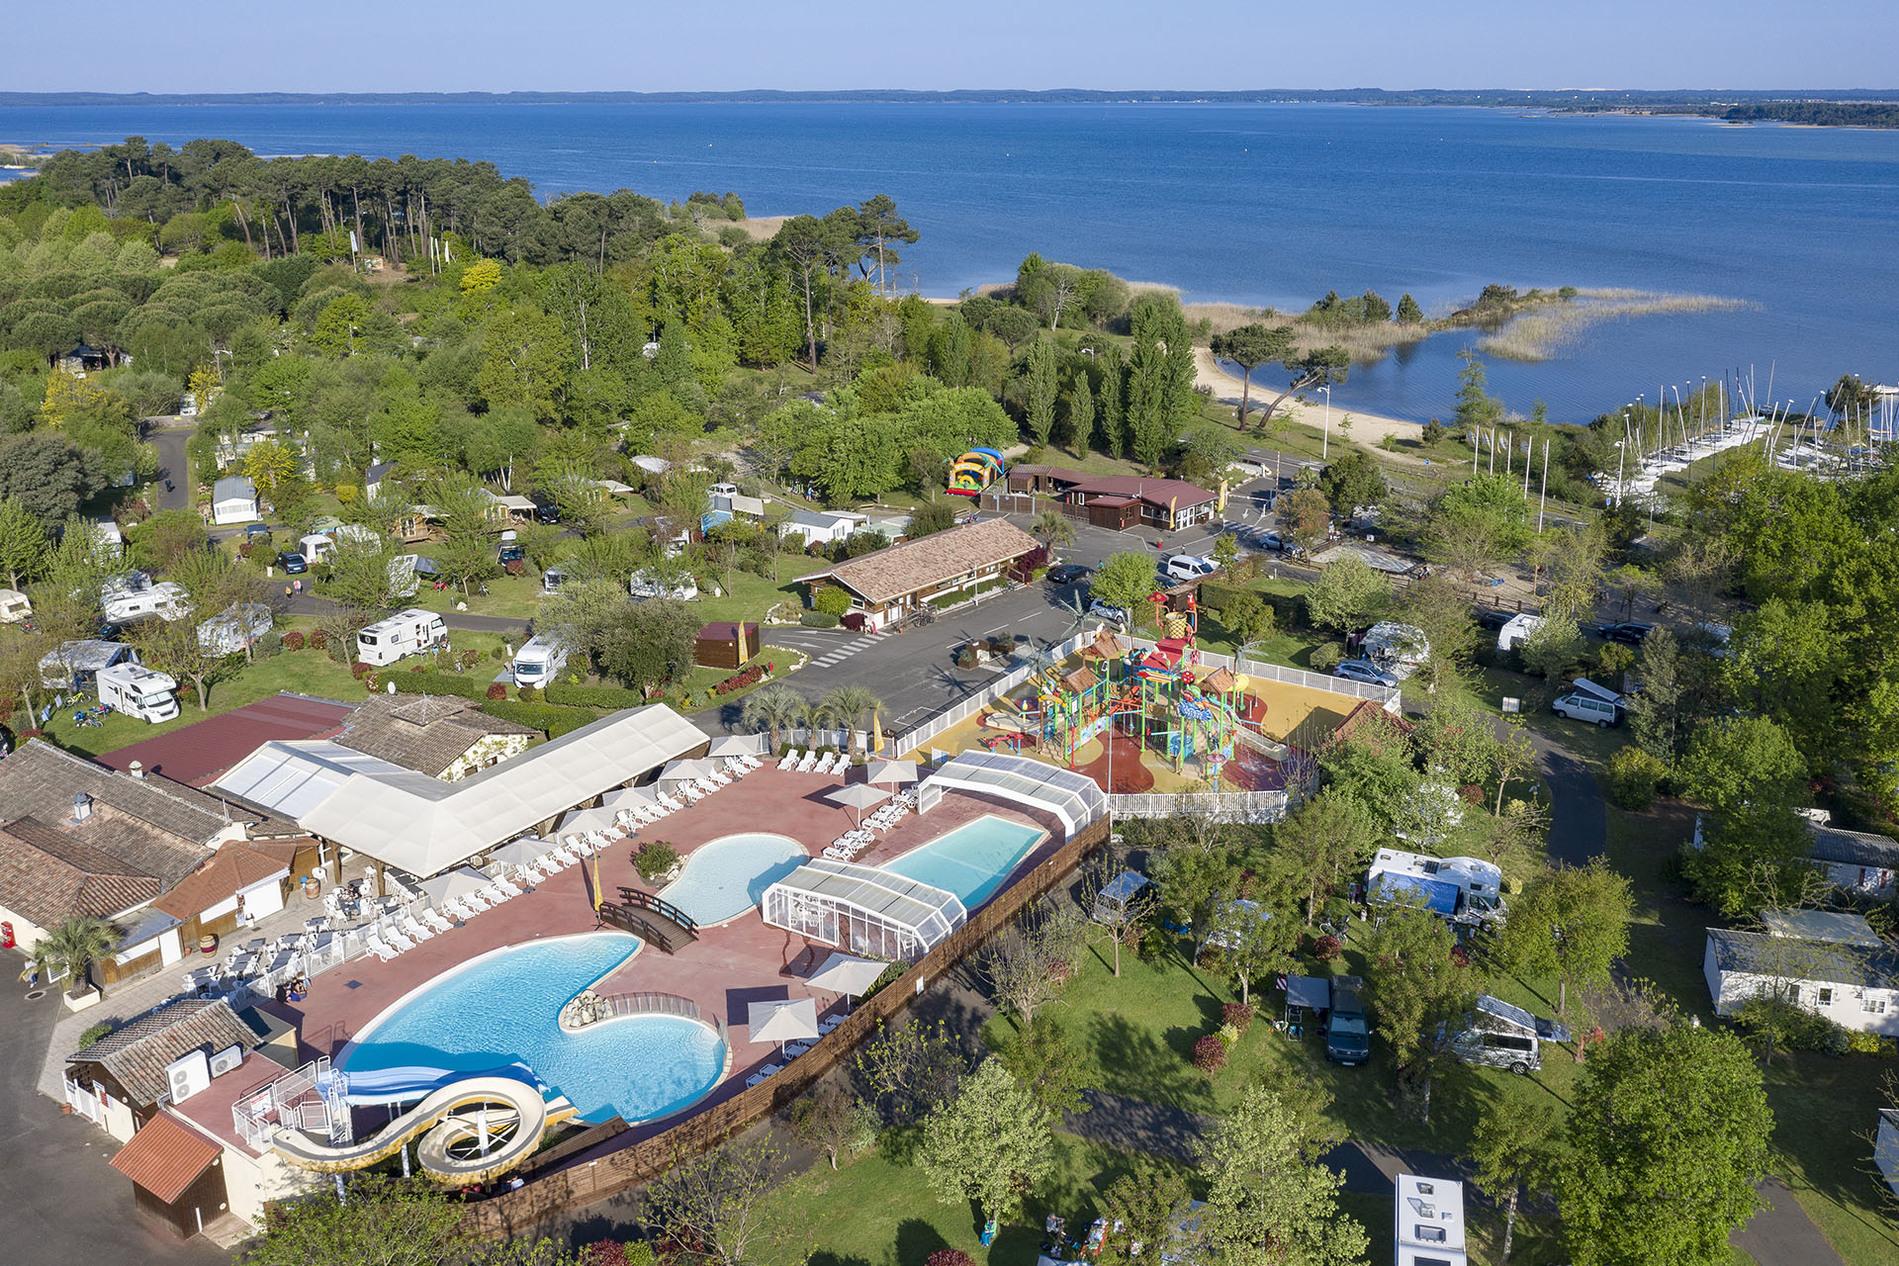 Frankrijk-Sanguinet-Camping%20Sandaya%20Sanguinet%20Plage-ExtraLarge Wintersport Frankrijk|Pagina 7 van 55